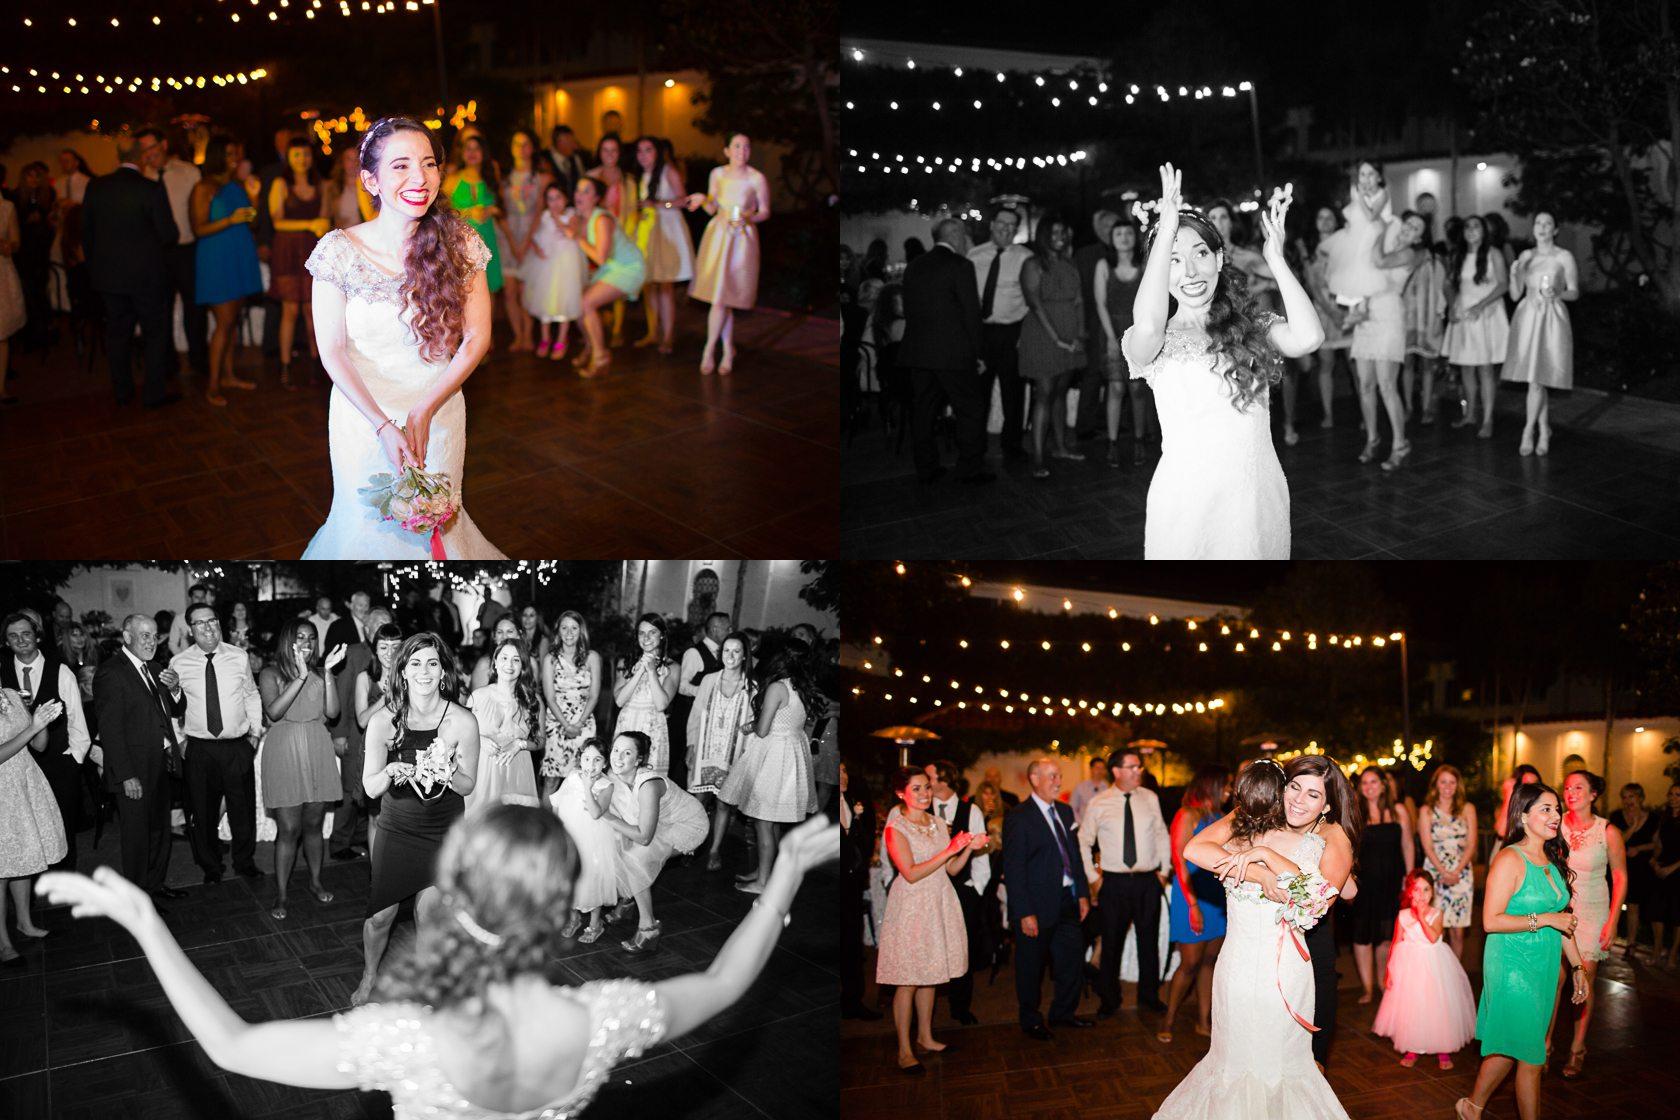 Darlington_House_Wedding_133.jpg